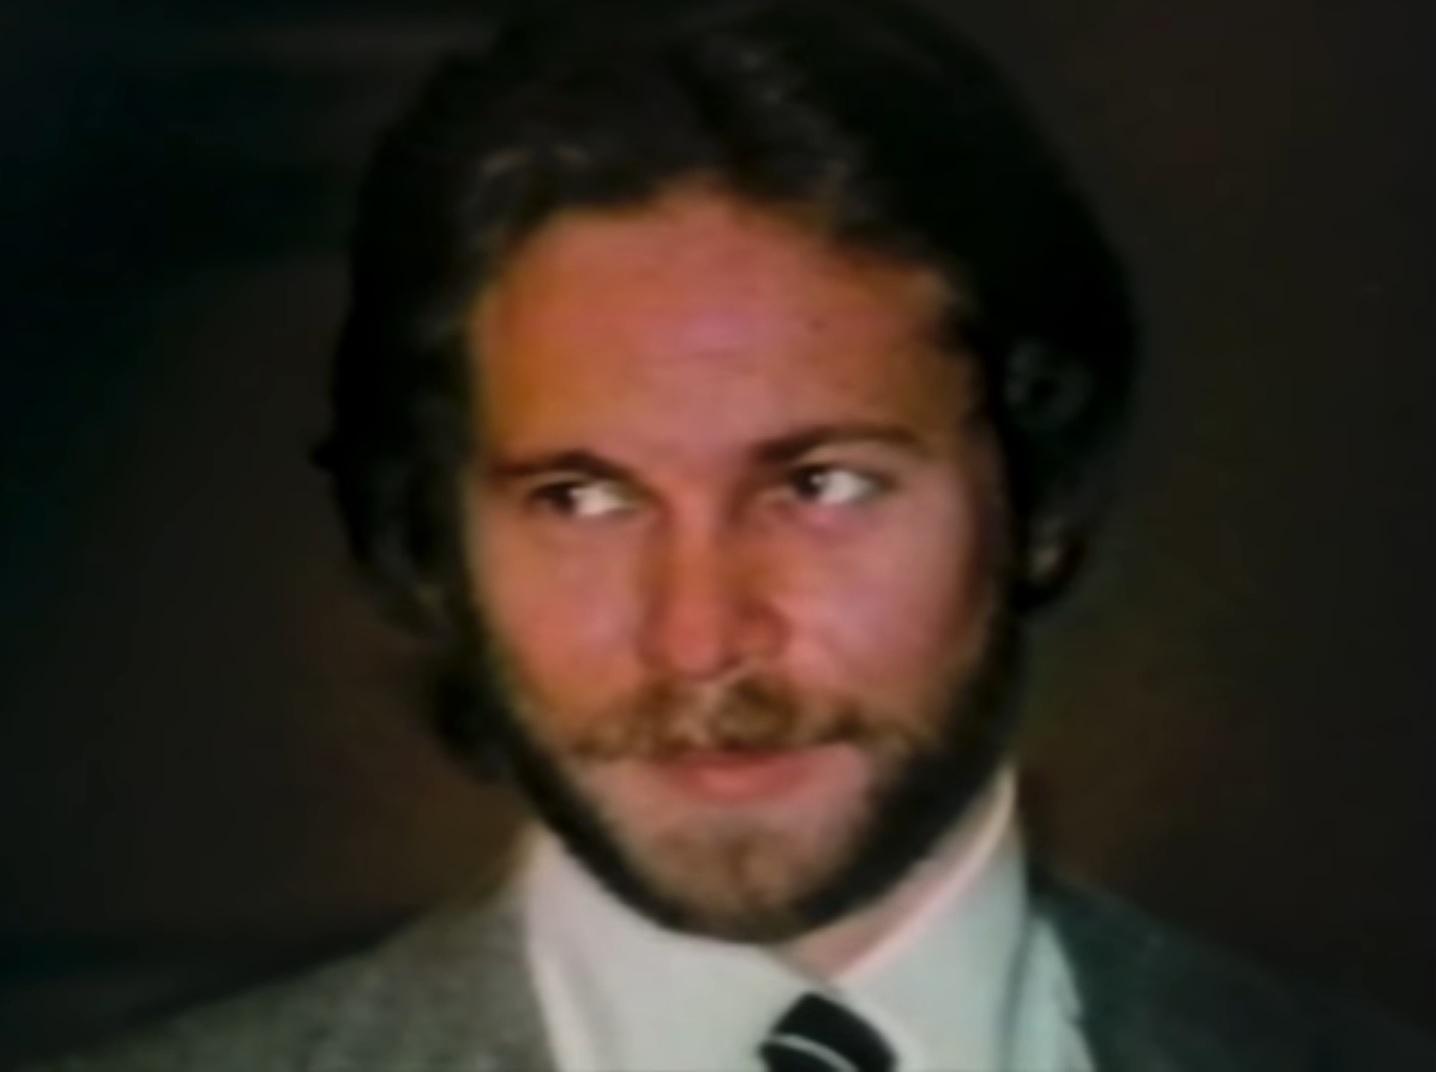 Donald Kemp | Unsolved Mysteries Wiki | FANDOM powered by Wikia